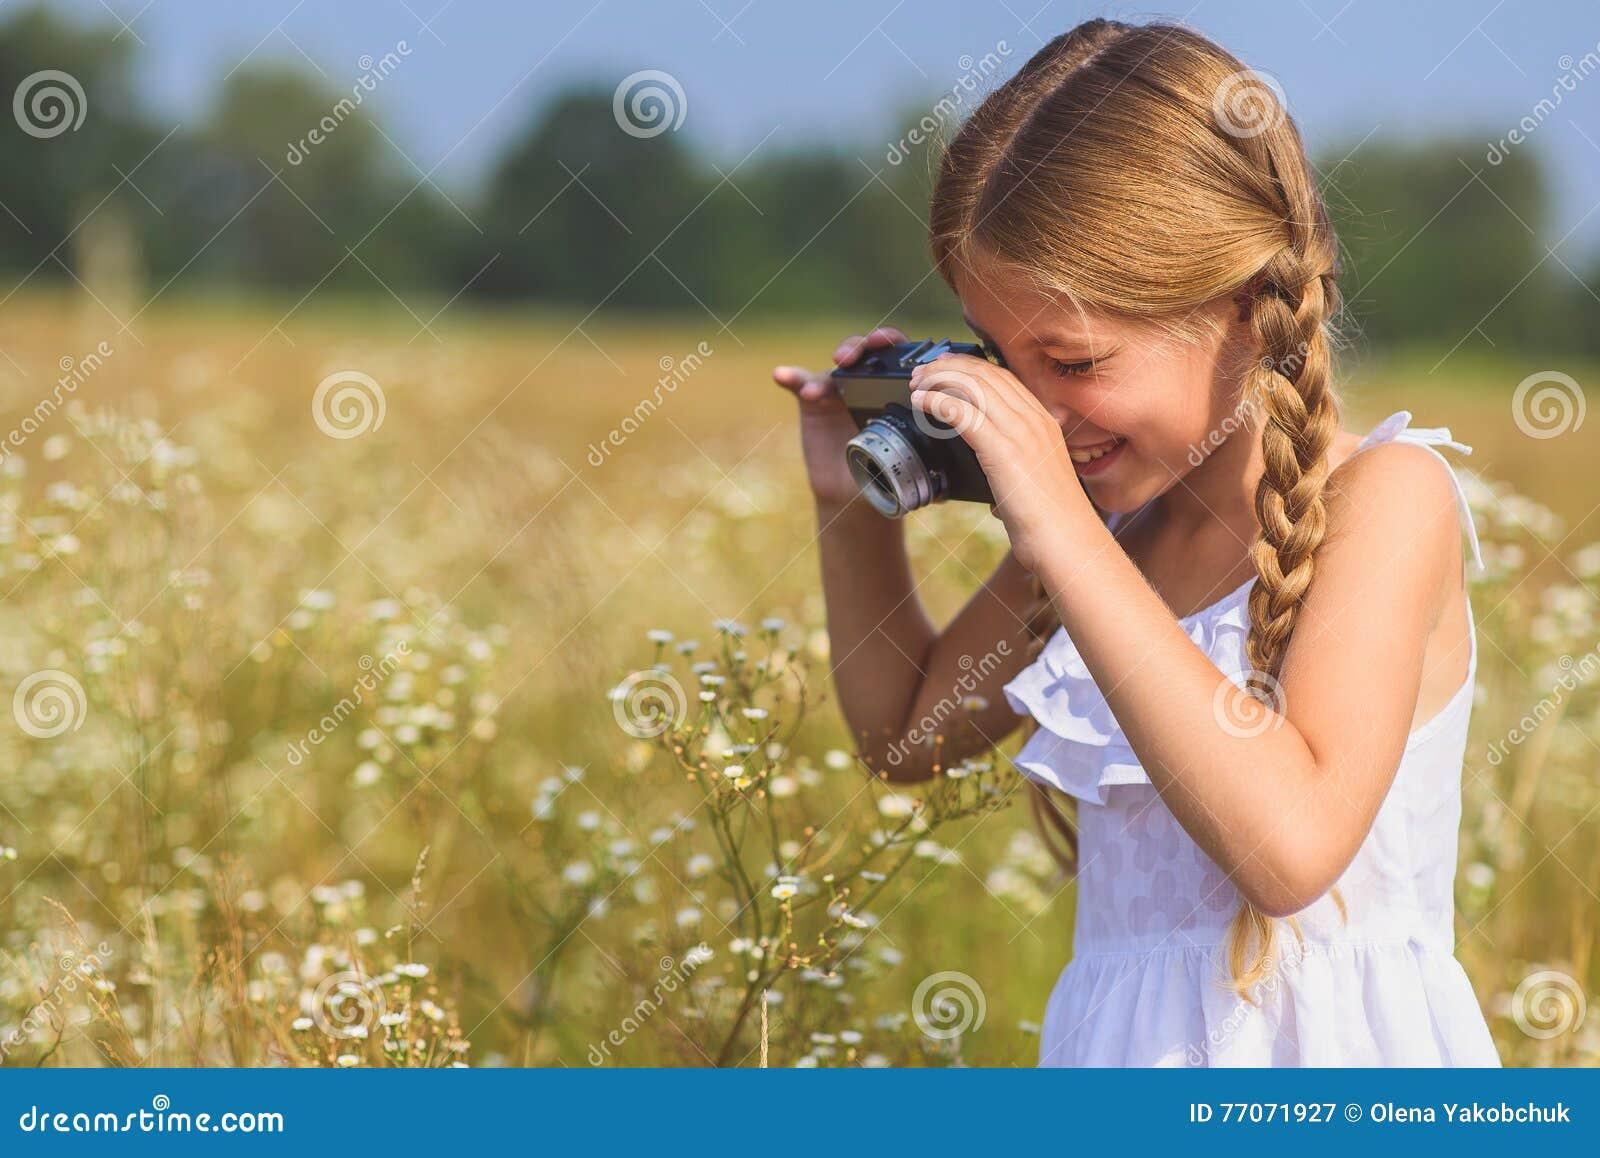 Cheerful girl photographing beautiful nature stock photo for Cheerful nature